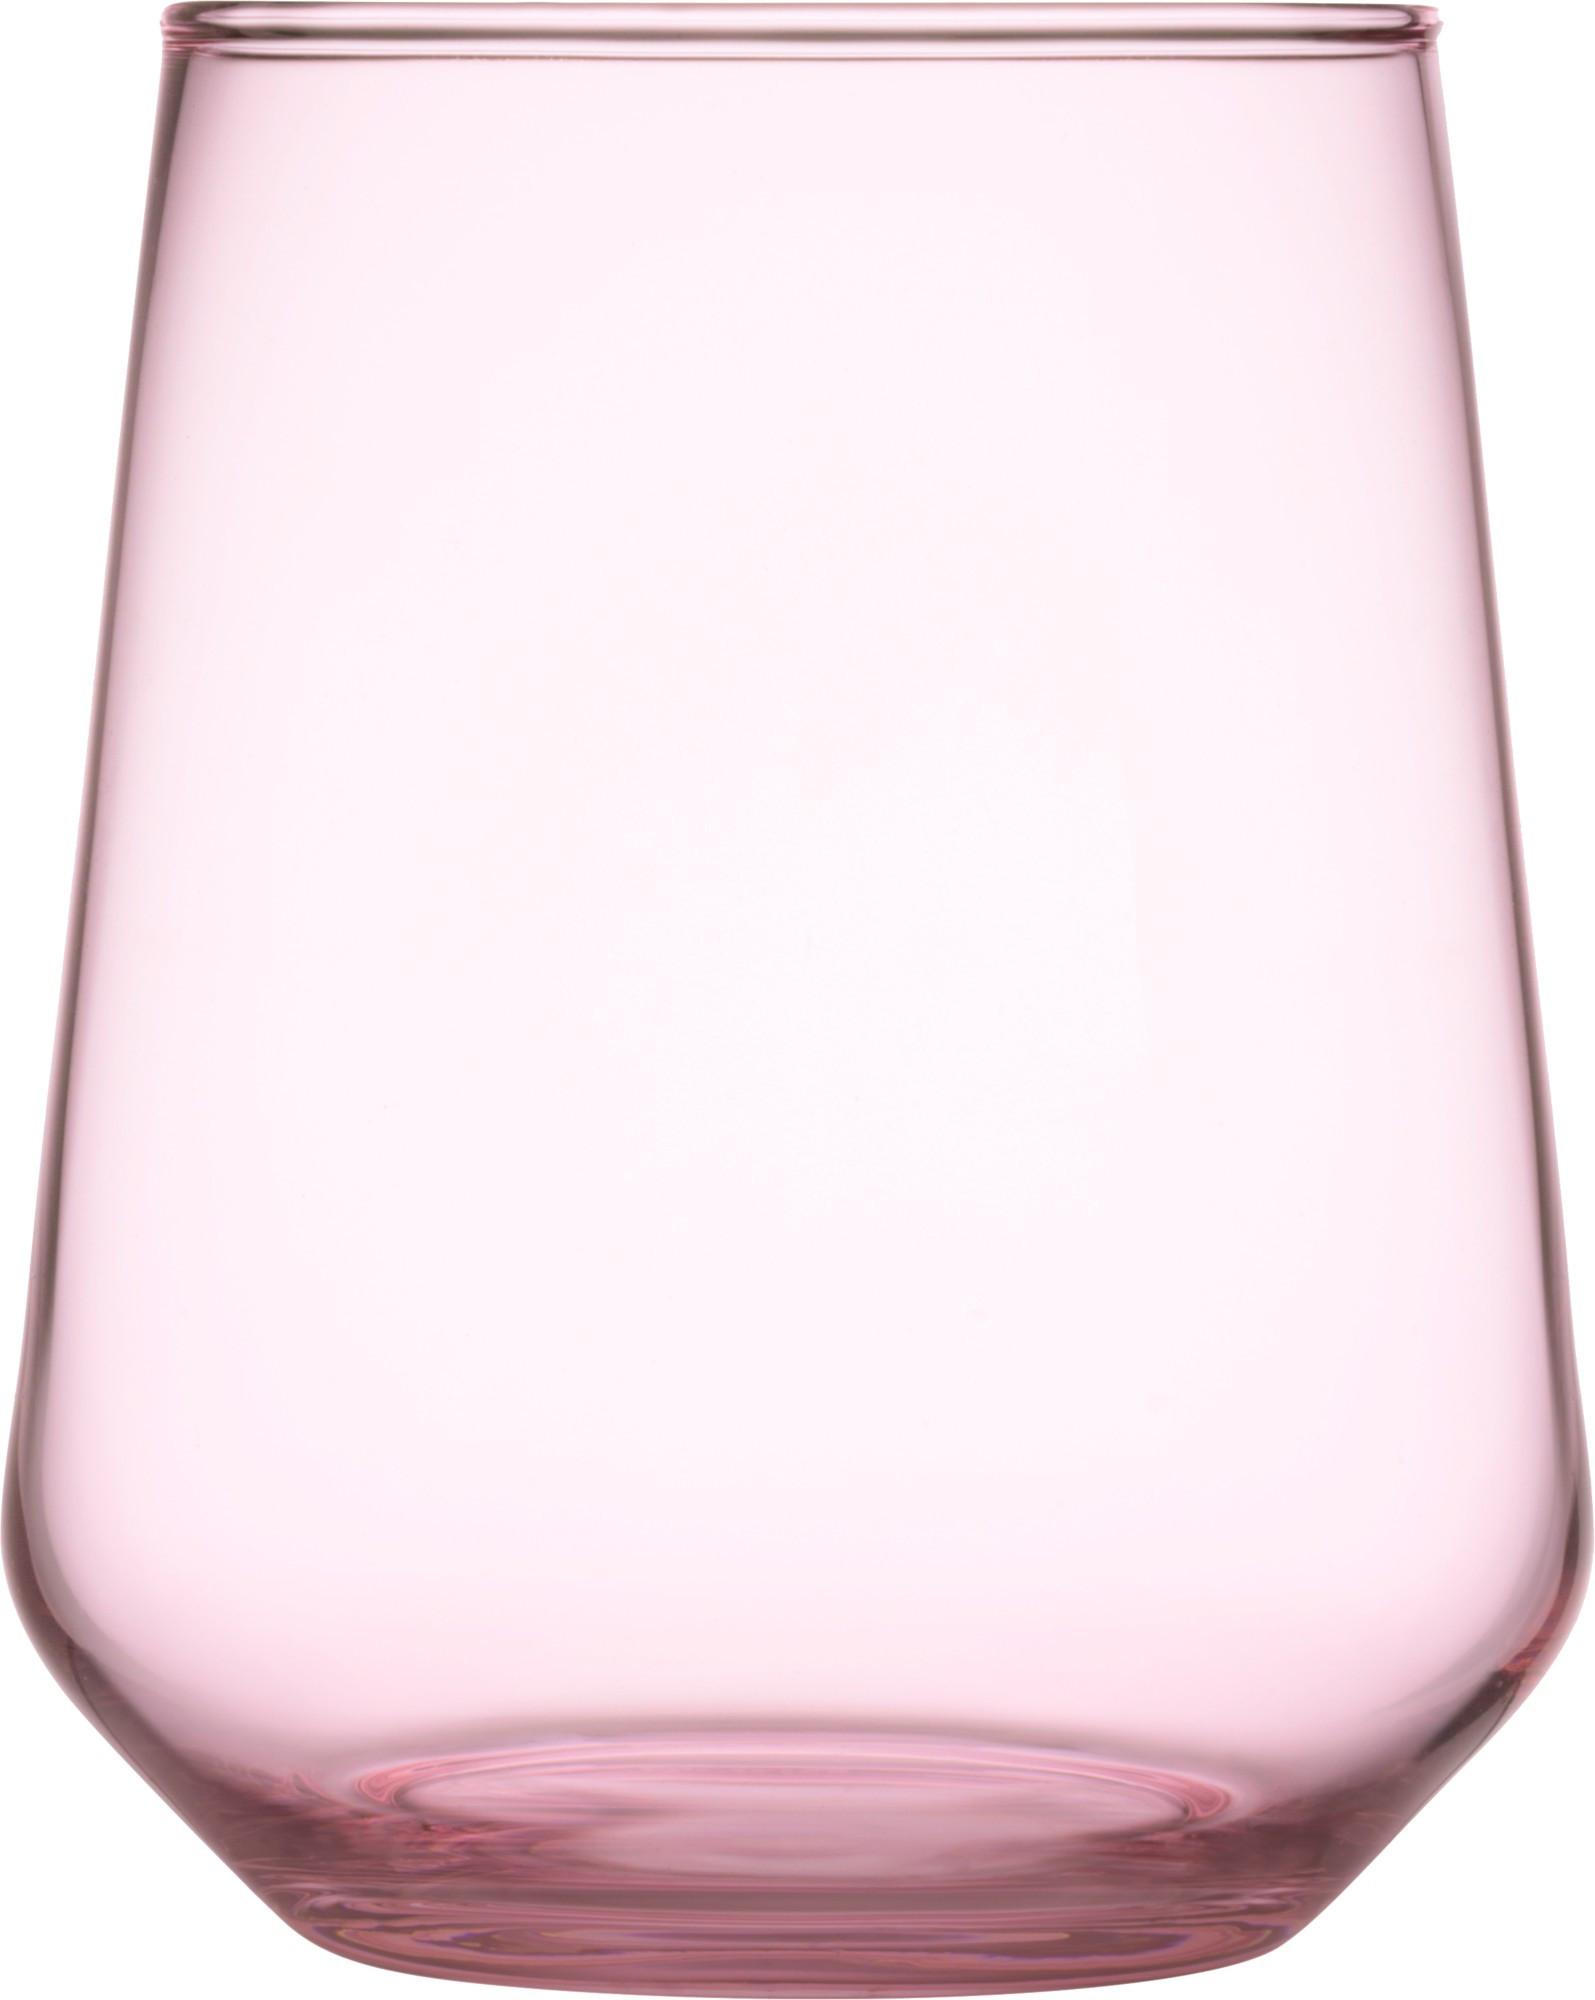 bohemia crystal vase price of iittala essence tumbler 35 cl pale pink 2 pcs iittala com within iittala essence tumbler 35cl pale pink 2pc